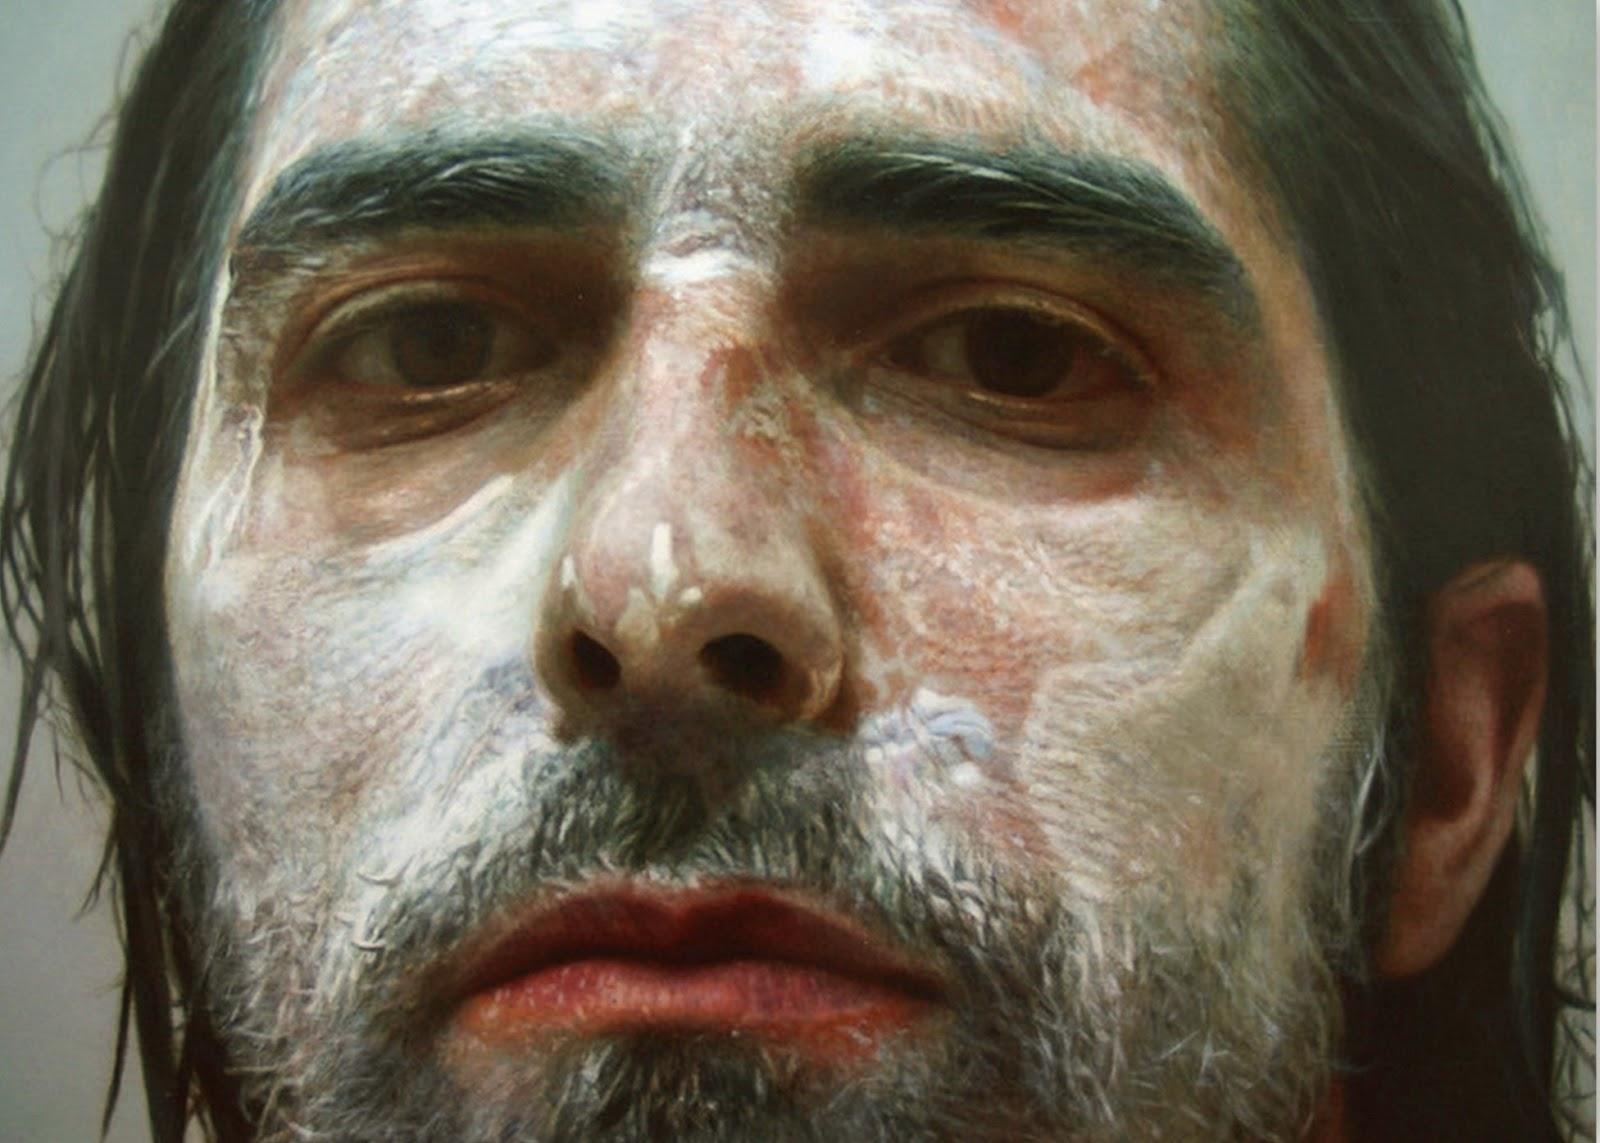 cuadros-de-retratos-artisticos